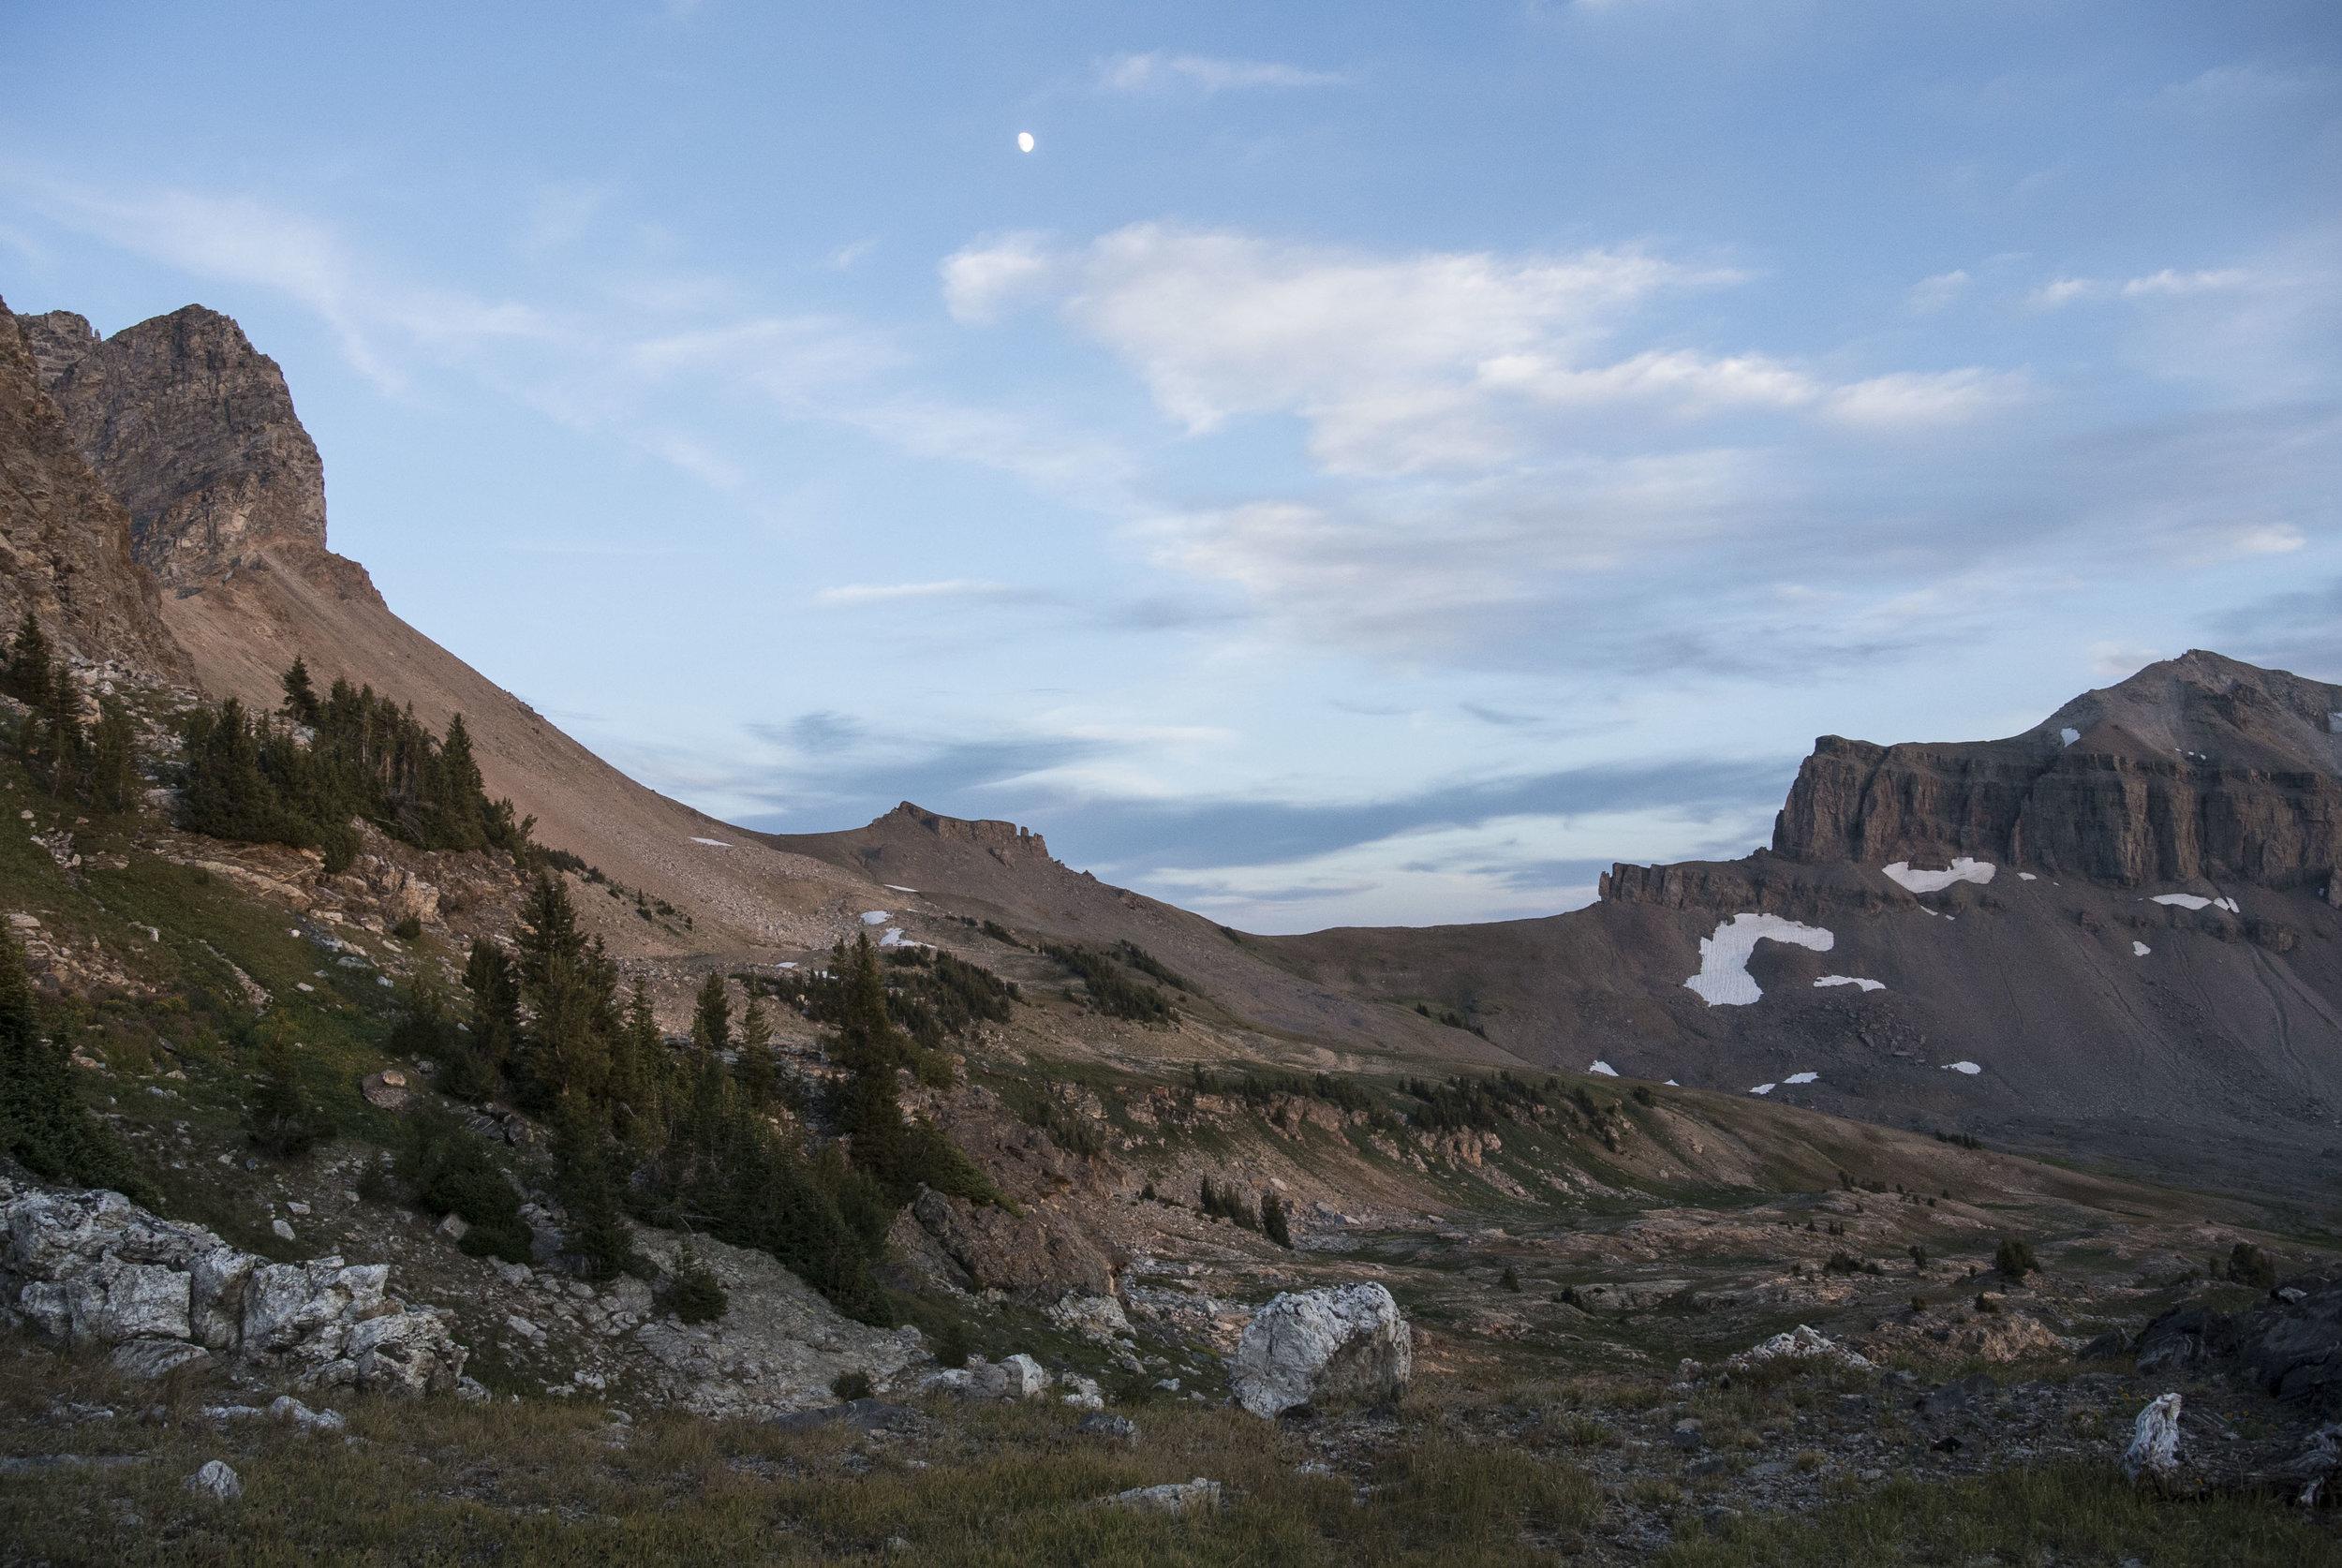 The moon rises beside Buck Peak in the Caribou-Targhee National forest, overlooking the Alaska Basin in Wyoming, in August 2016. (Megan Perra)